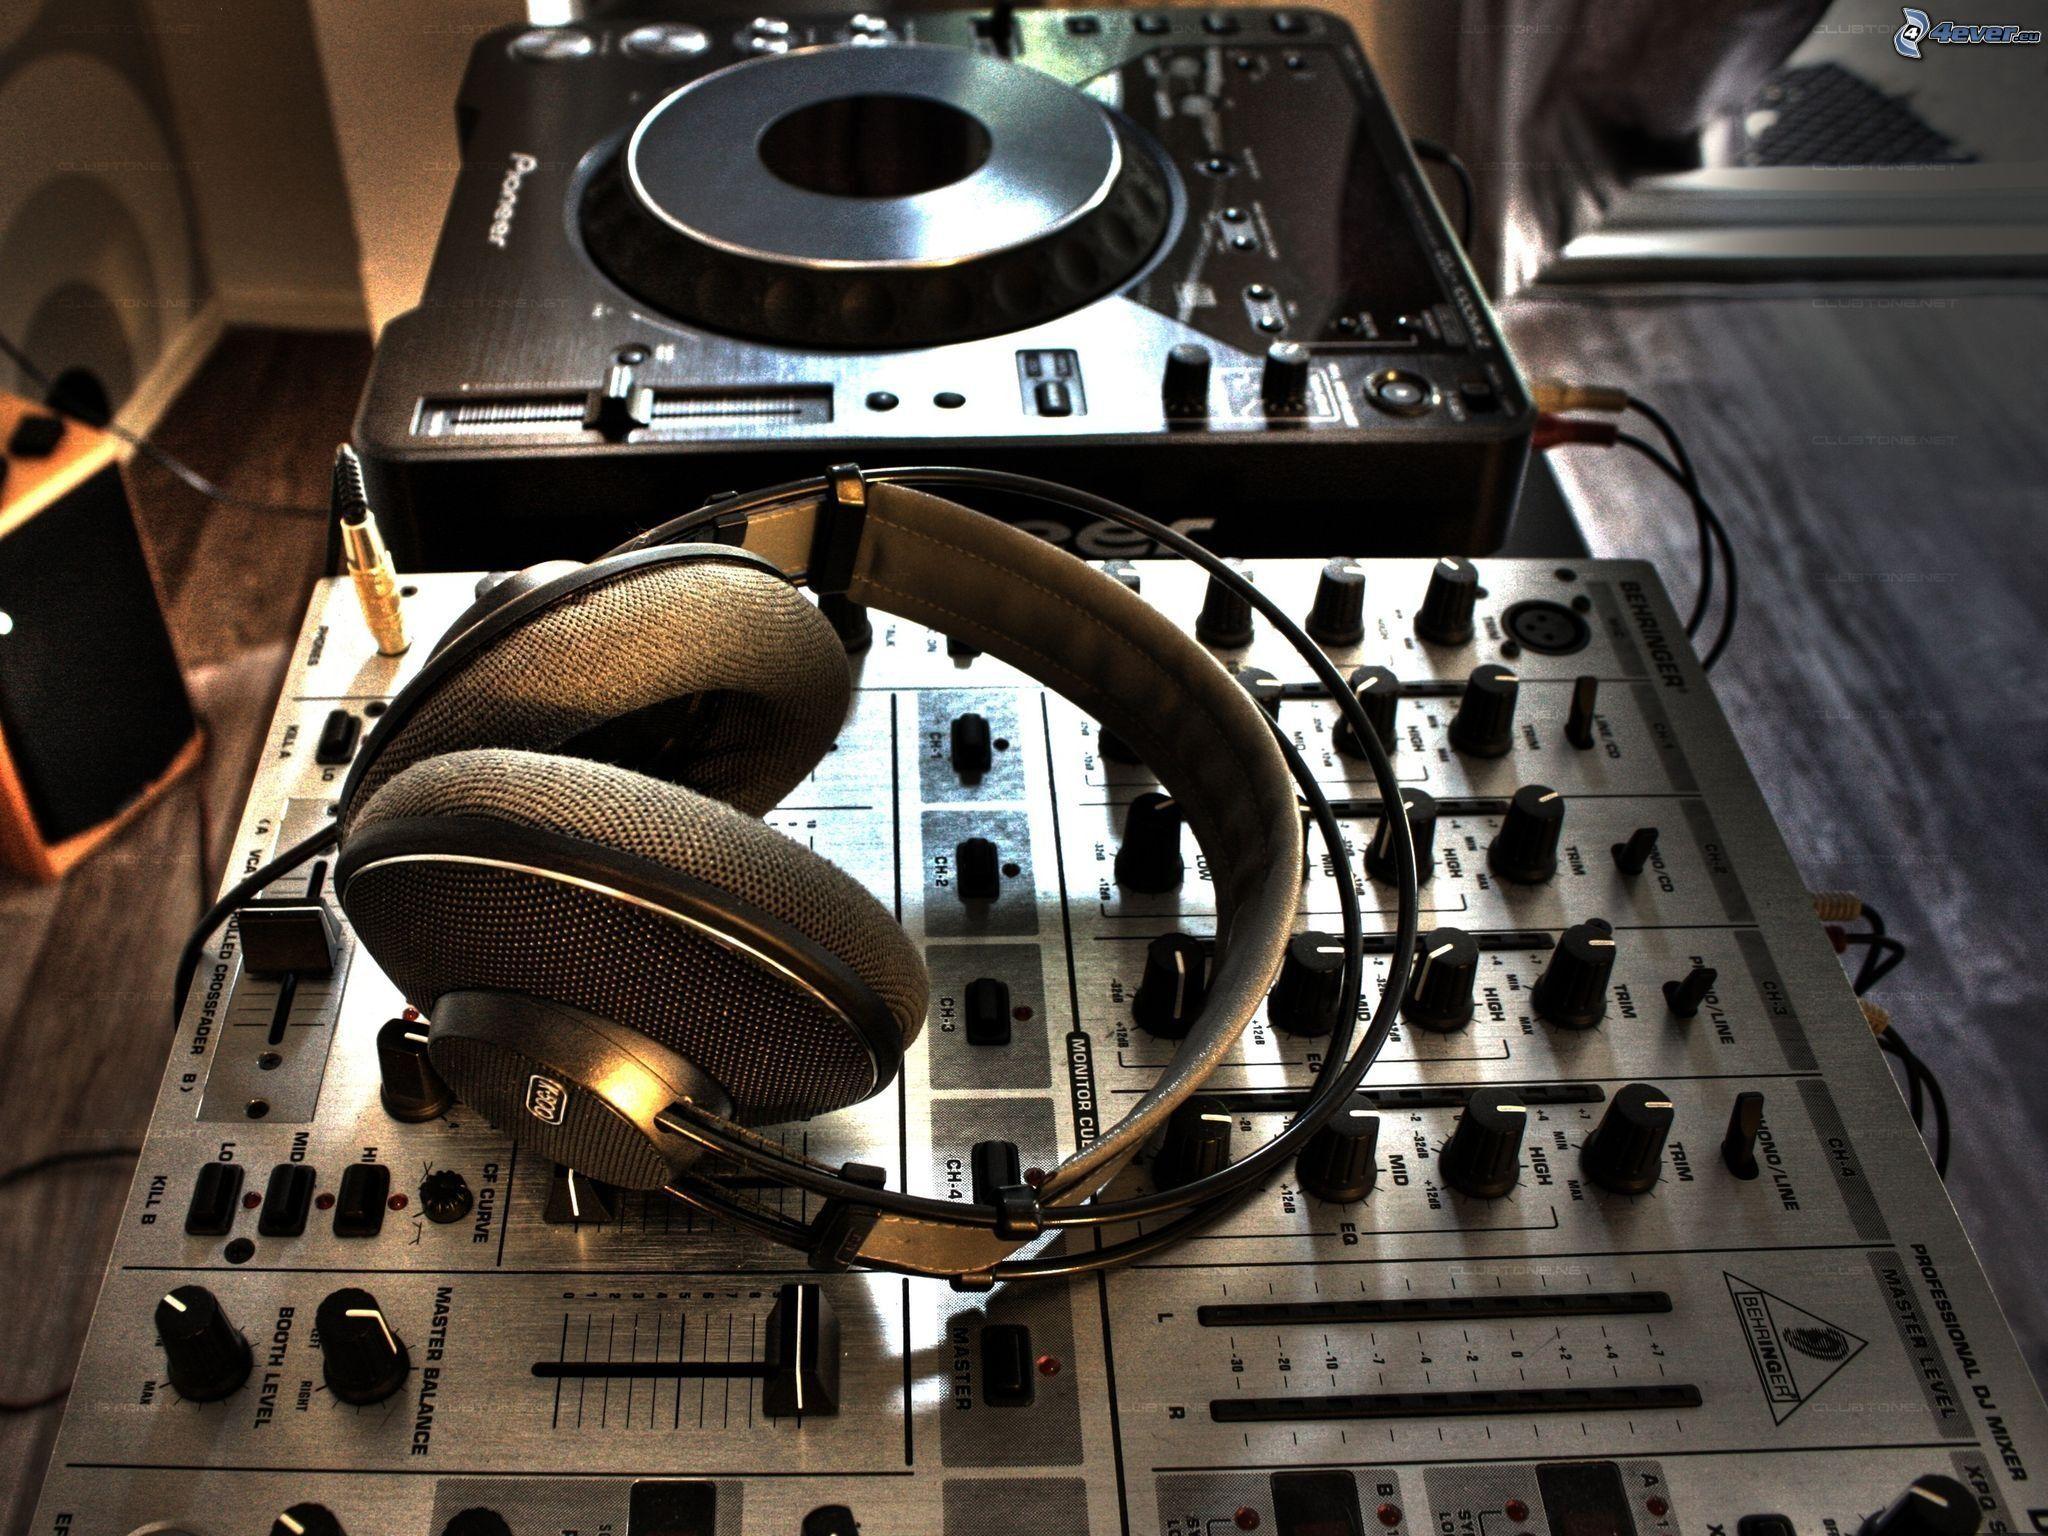 Download Dj Mixer Work 2048 X 2048 Wallpapers: DJ Console